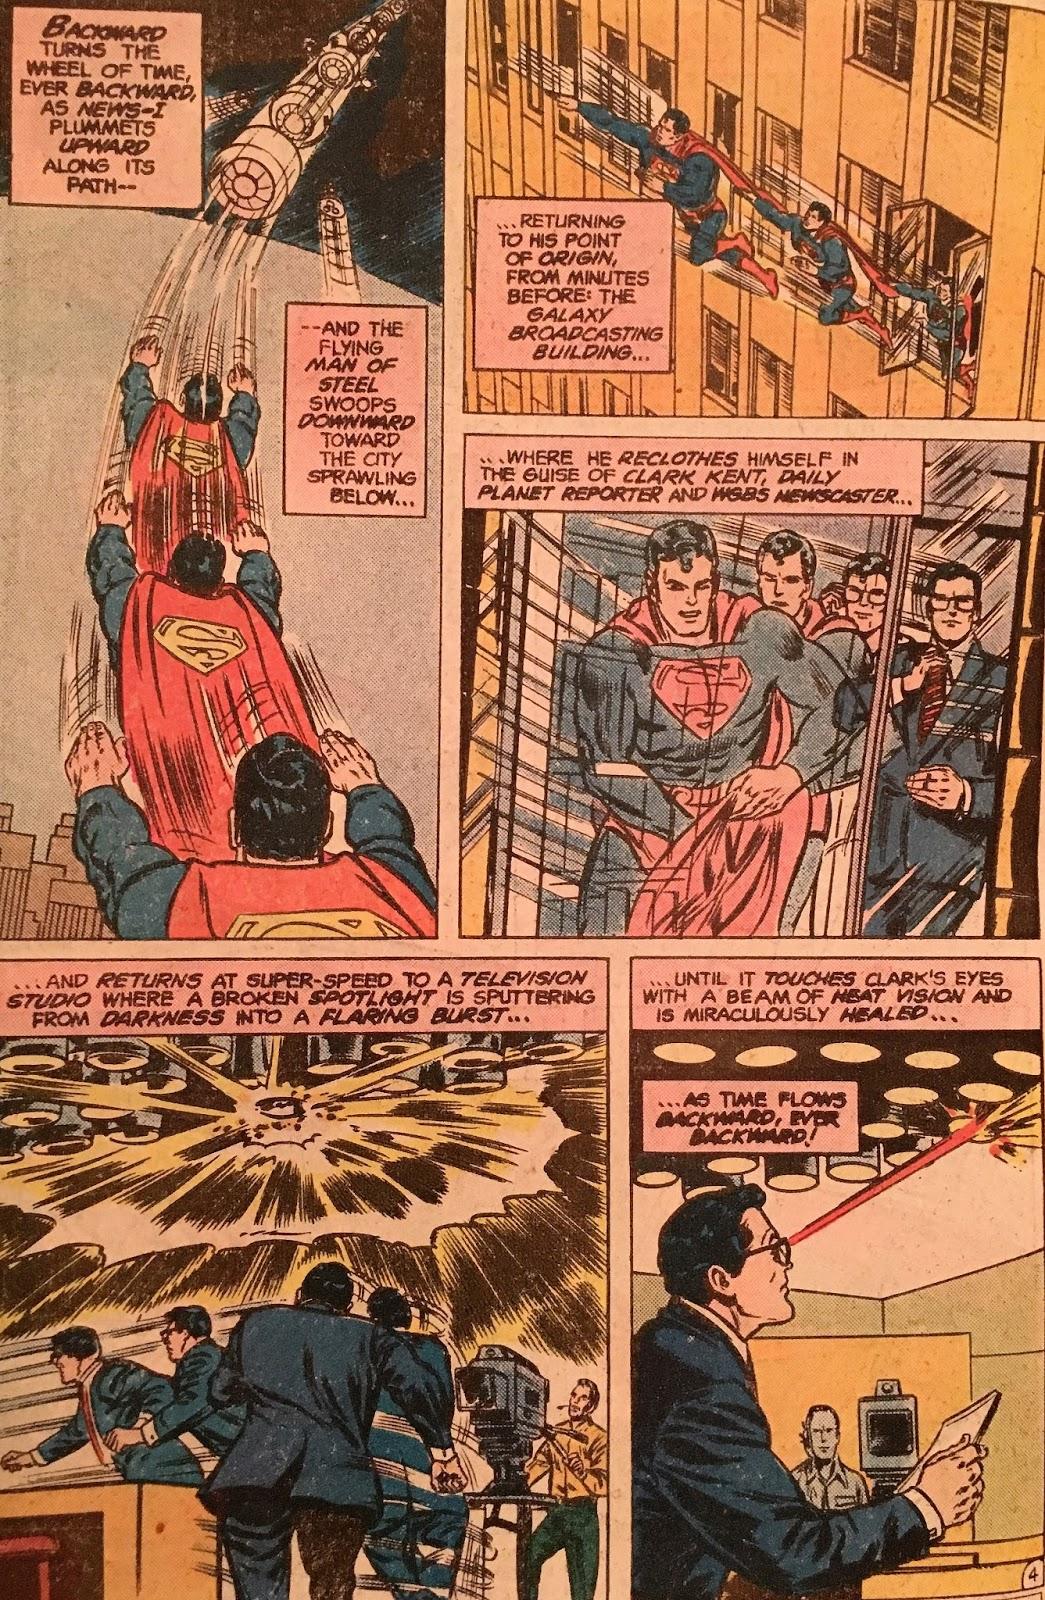 Chris is on Infinite Earths: Superman #345 (1980)